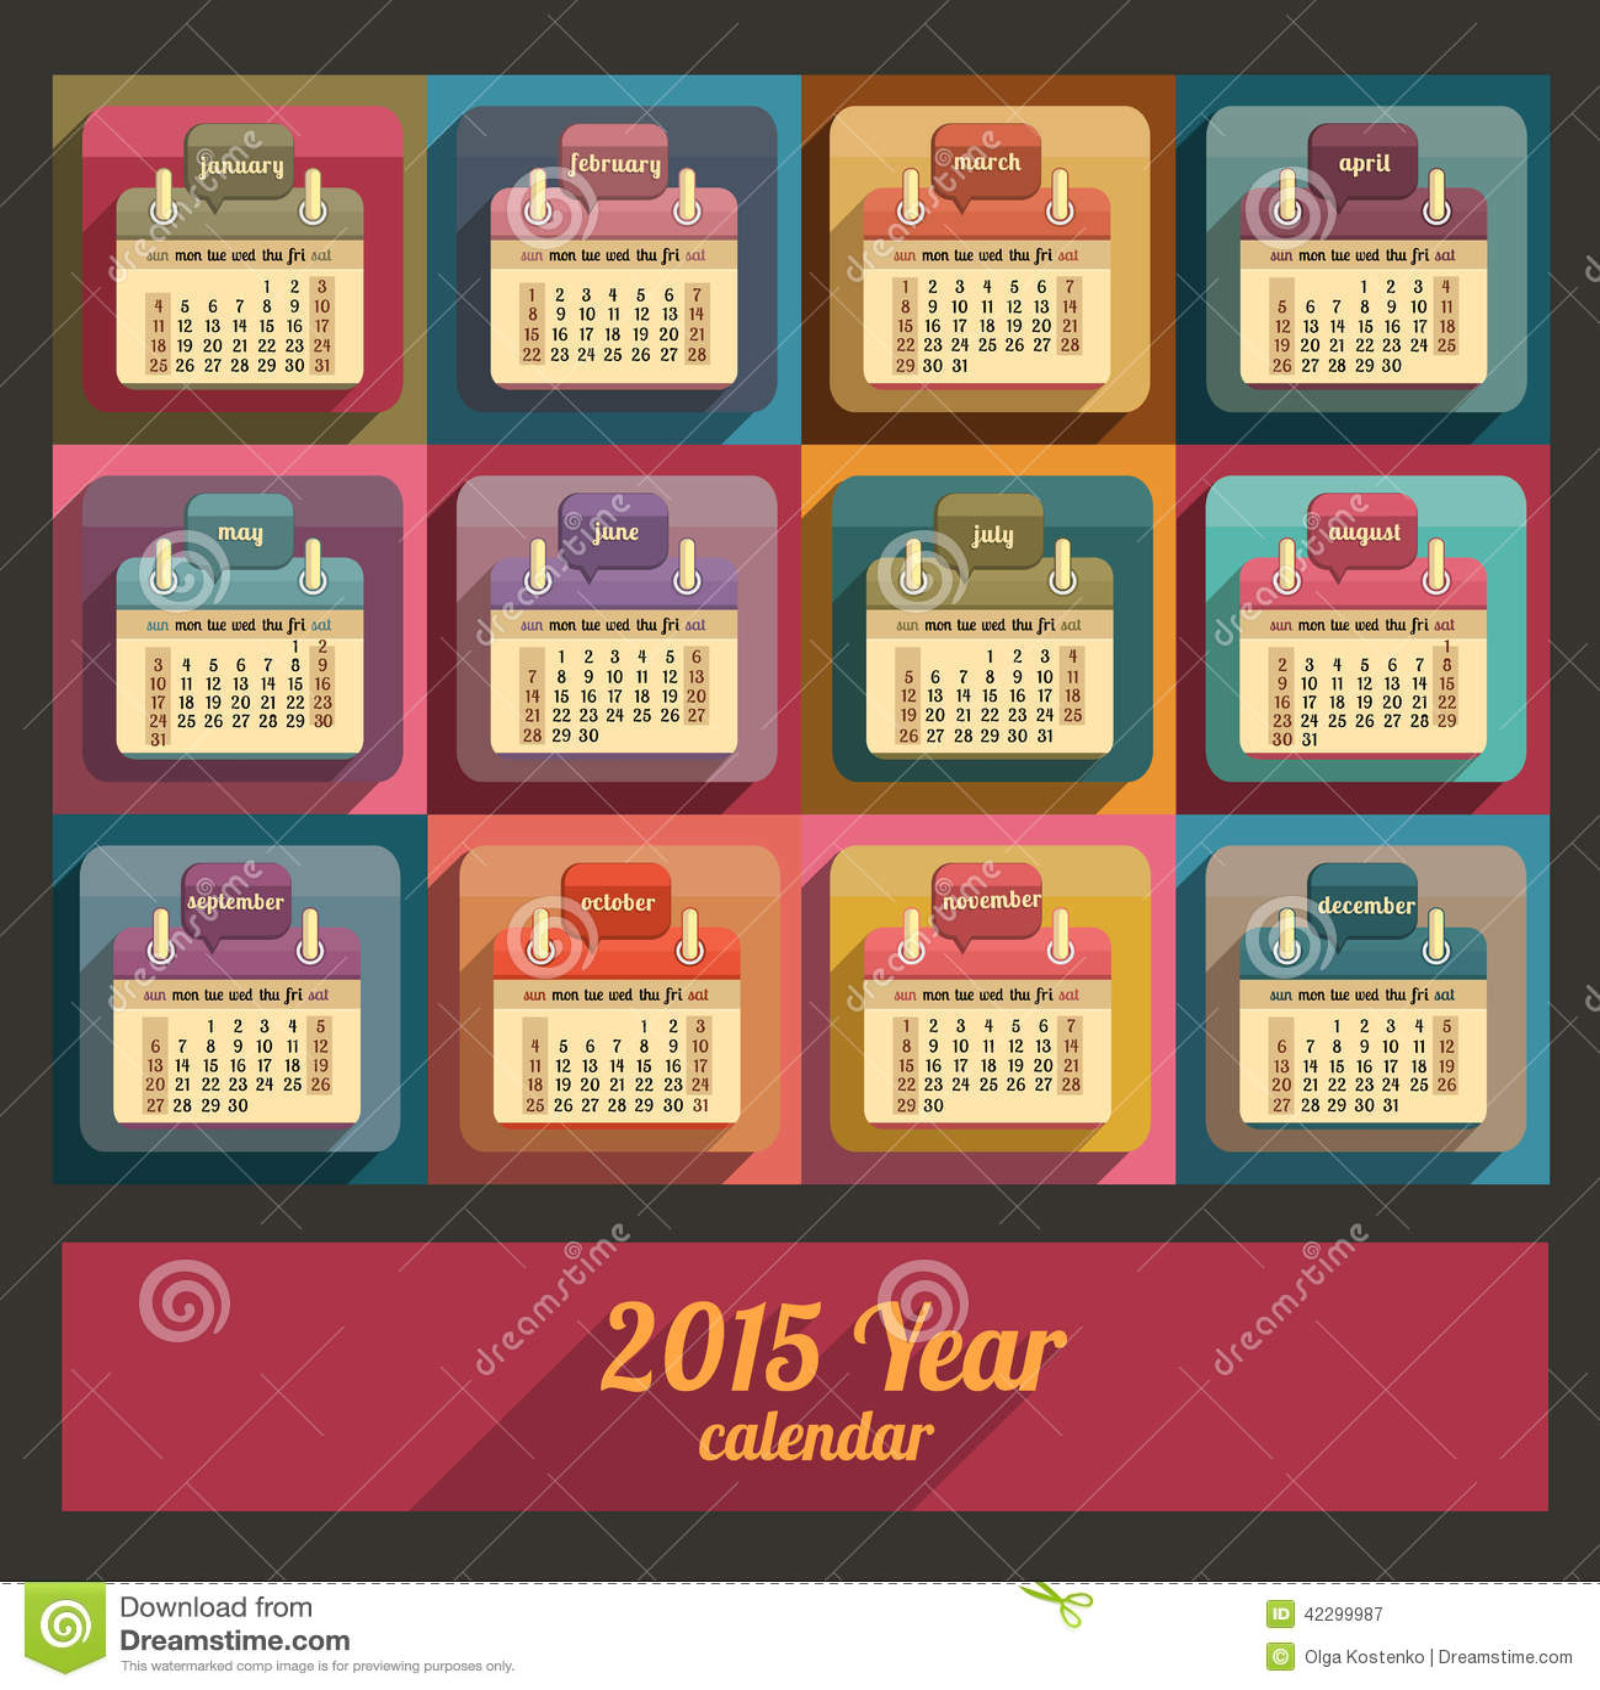 Flat Calendar 2015 Year Design Stock Vector Image 42299987